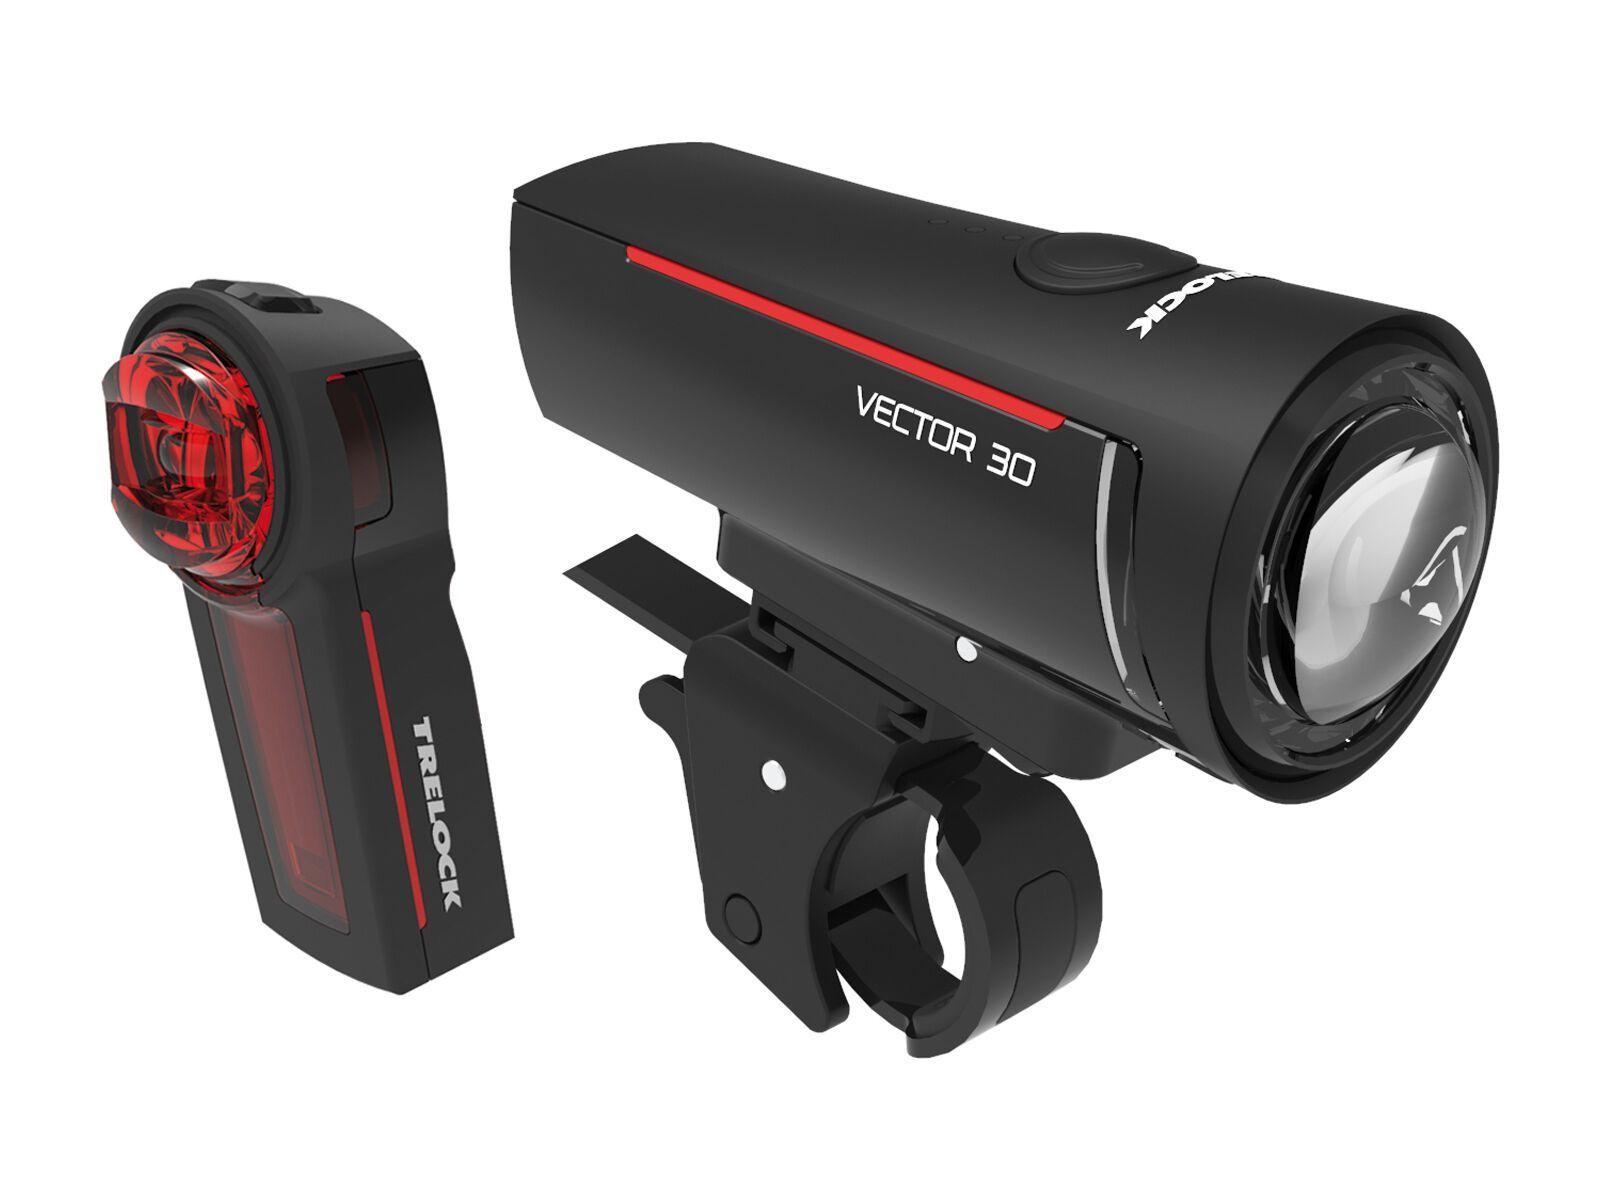 Trelock LS 300 I-Go Vector / LS 740 Vector - Beleuchtungsset 8005401